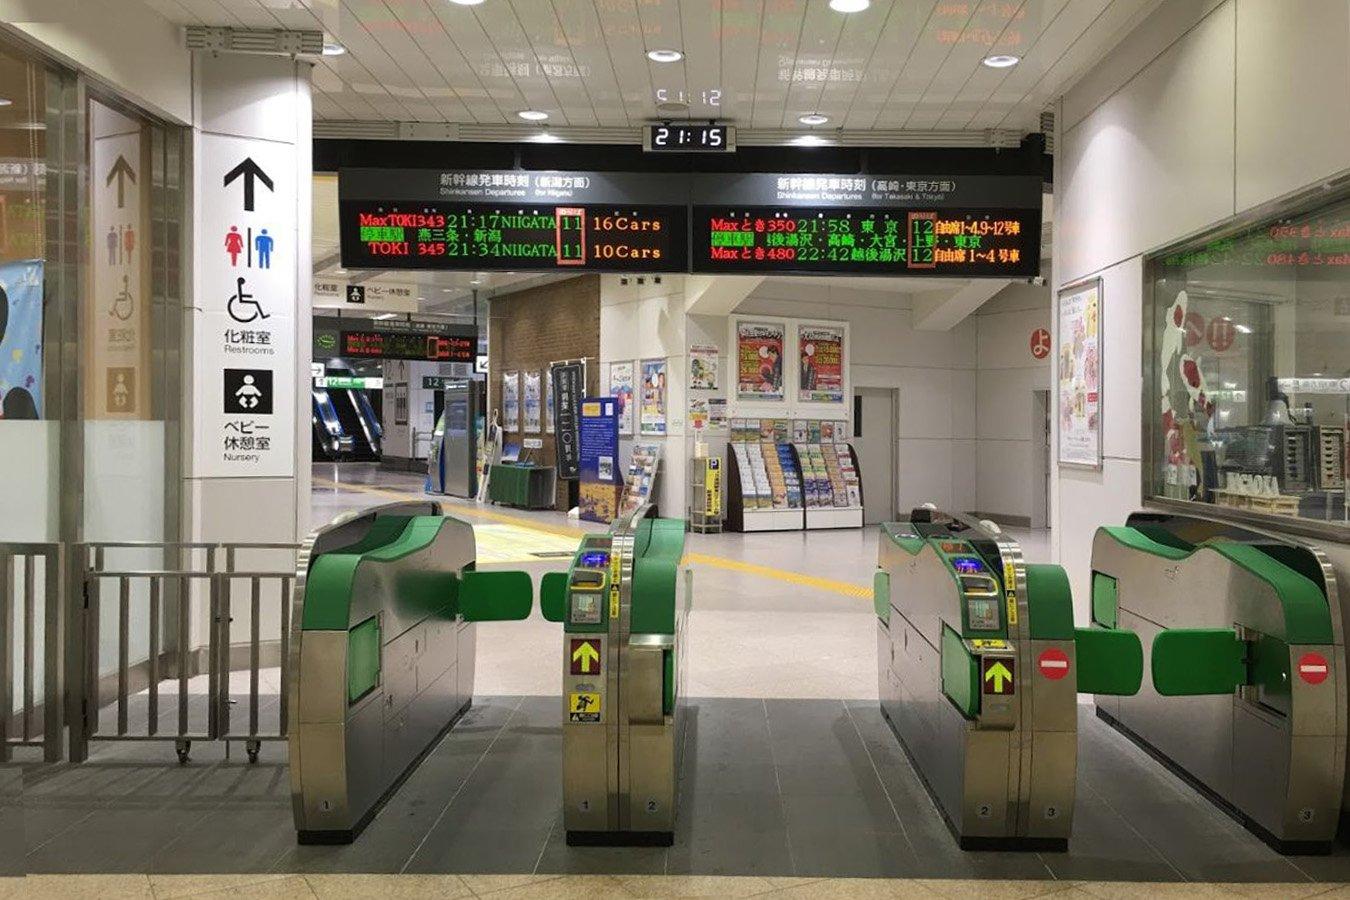 駅 出入り 同じ 改札